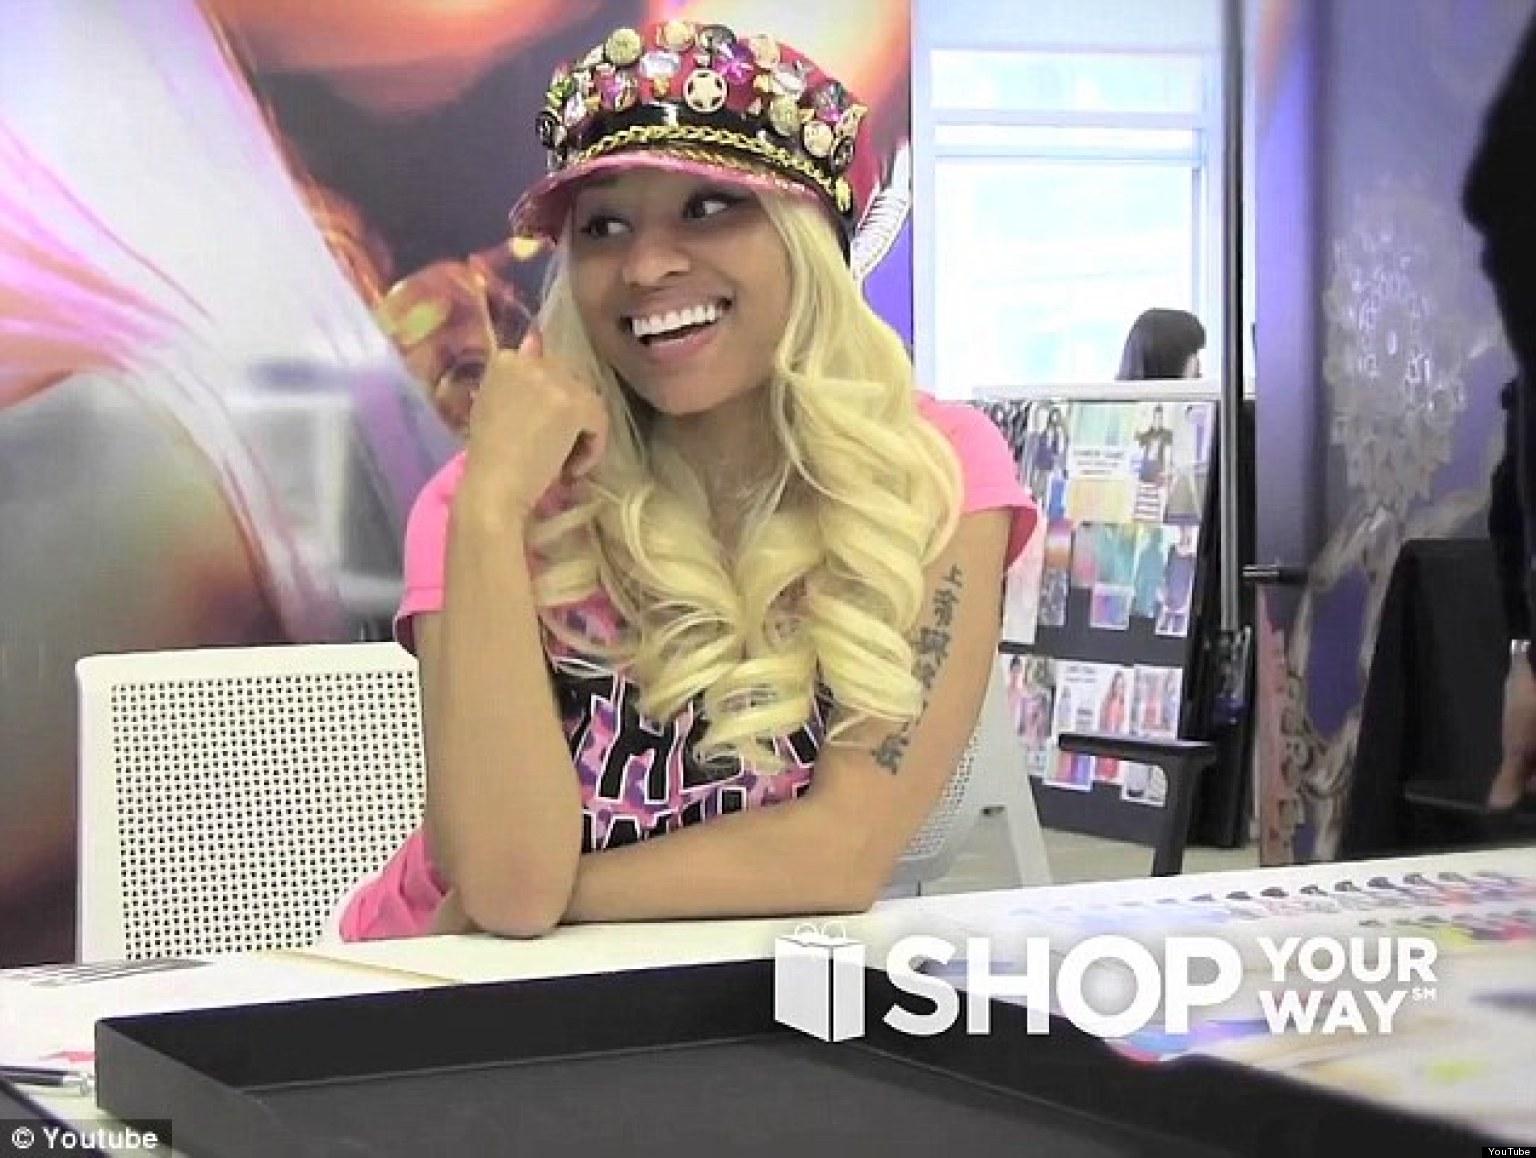 Nicki Minaj Kmart Clothing Line Is Crazier Than We